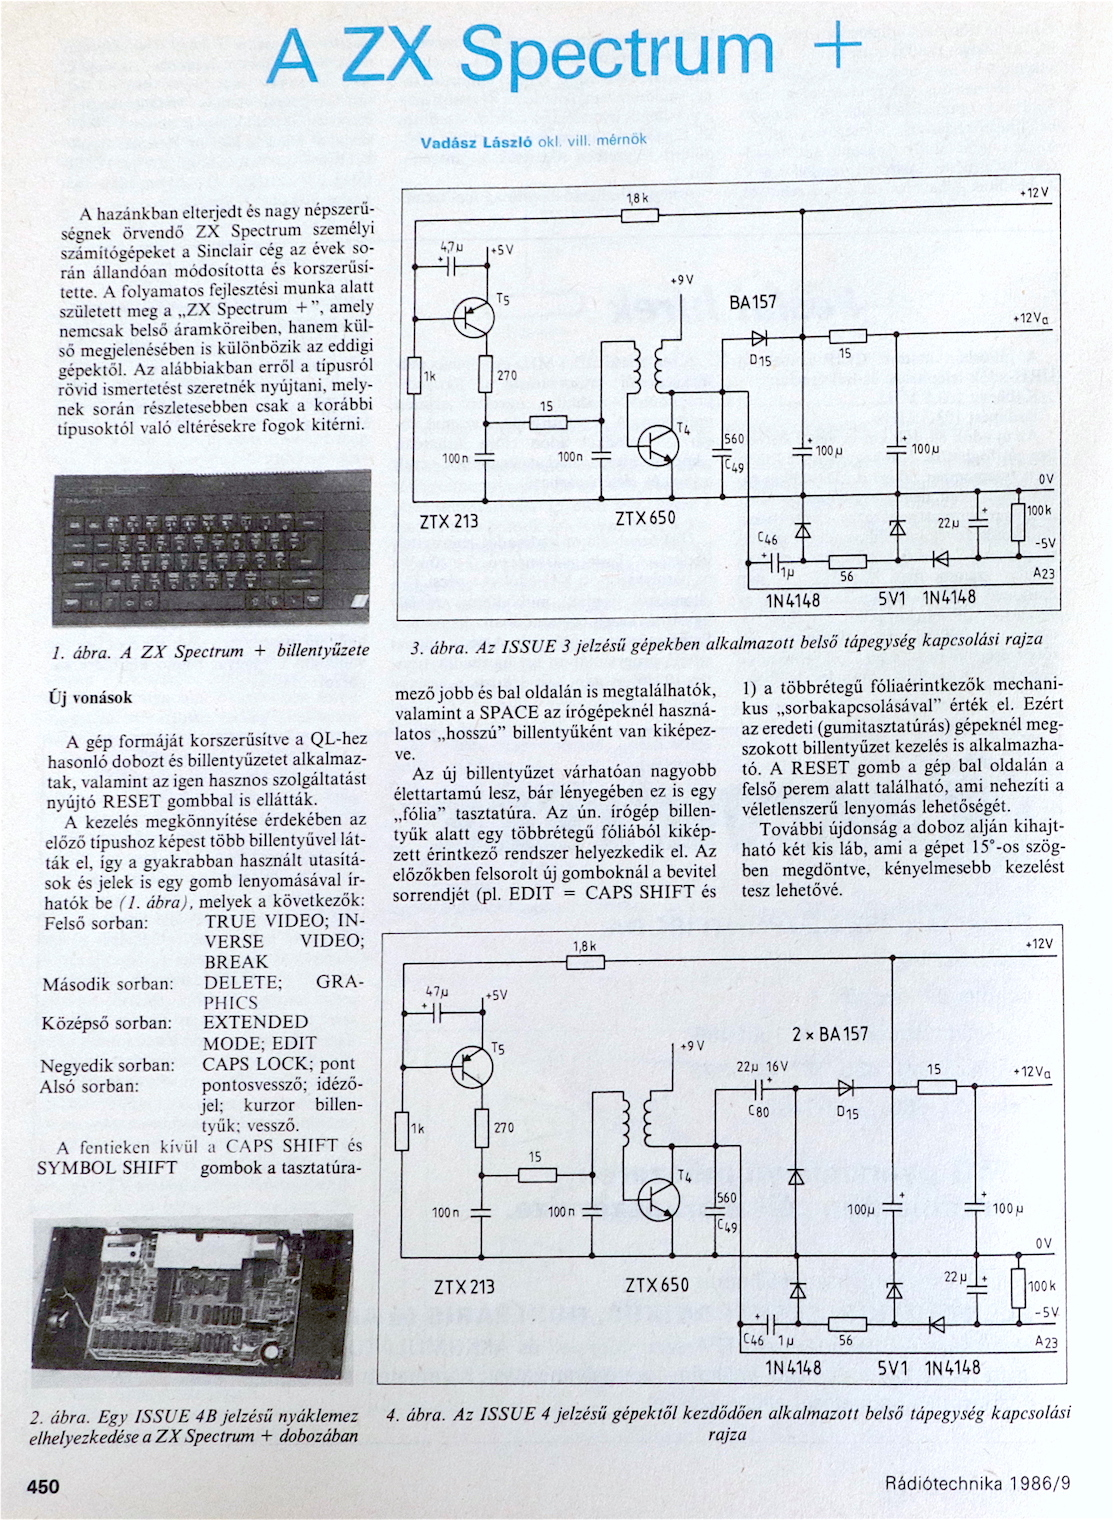 Rádiótechnika Spectrum+ 1. oldal